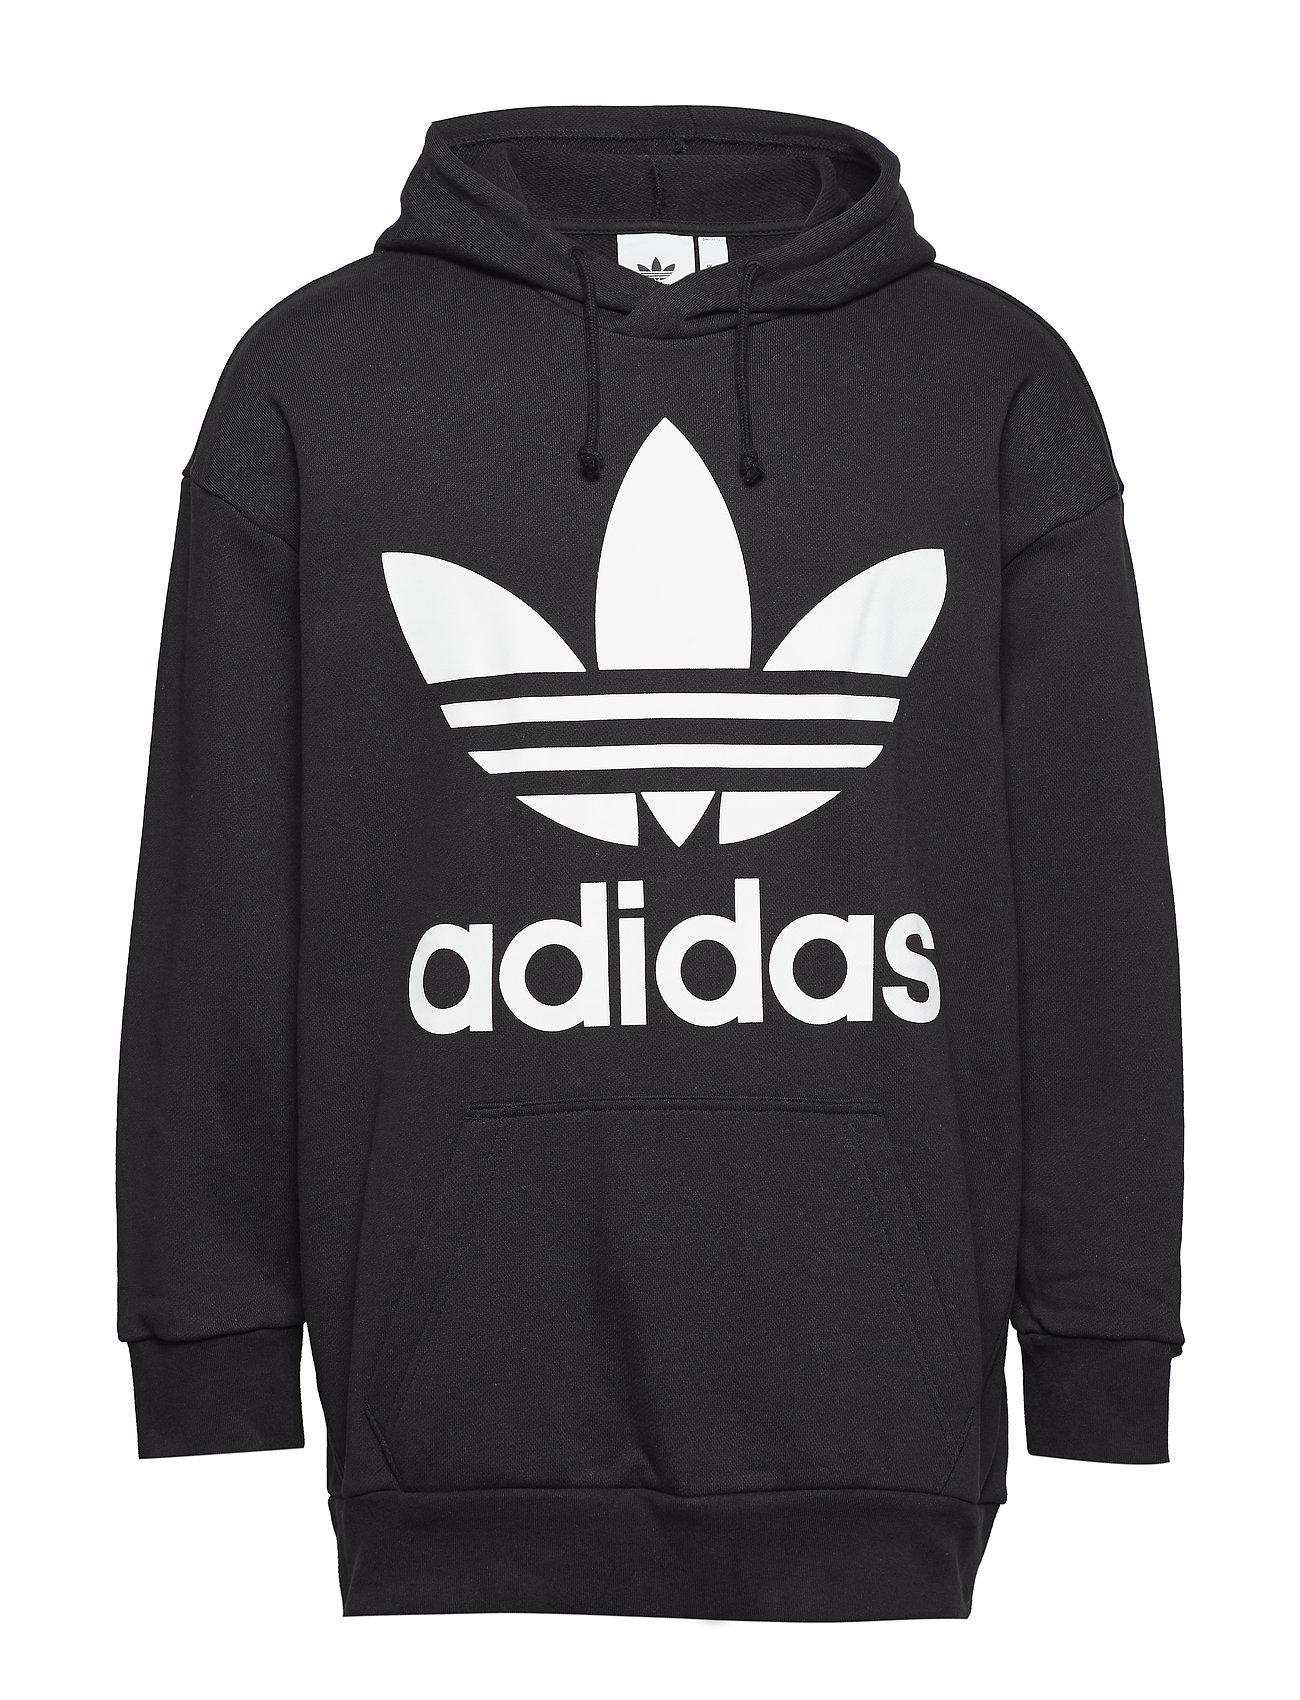 c6fc0963 Adidas hoodies – Tref Over Hood til herre i Sort - Pashion.dk